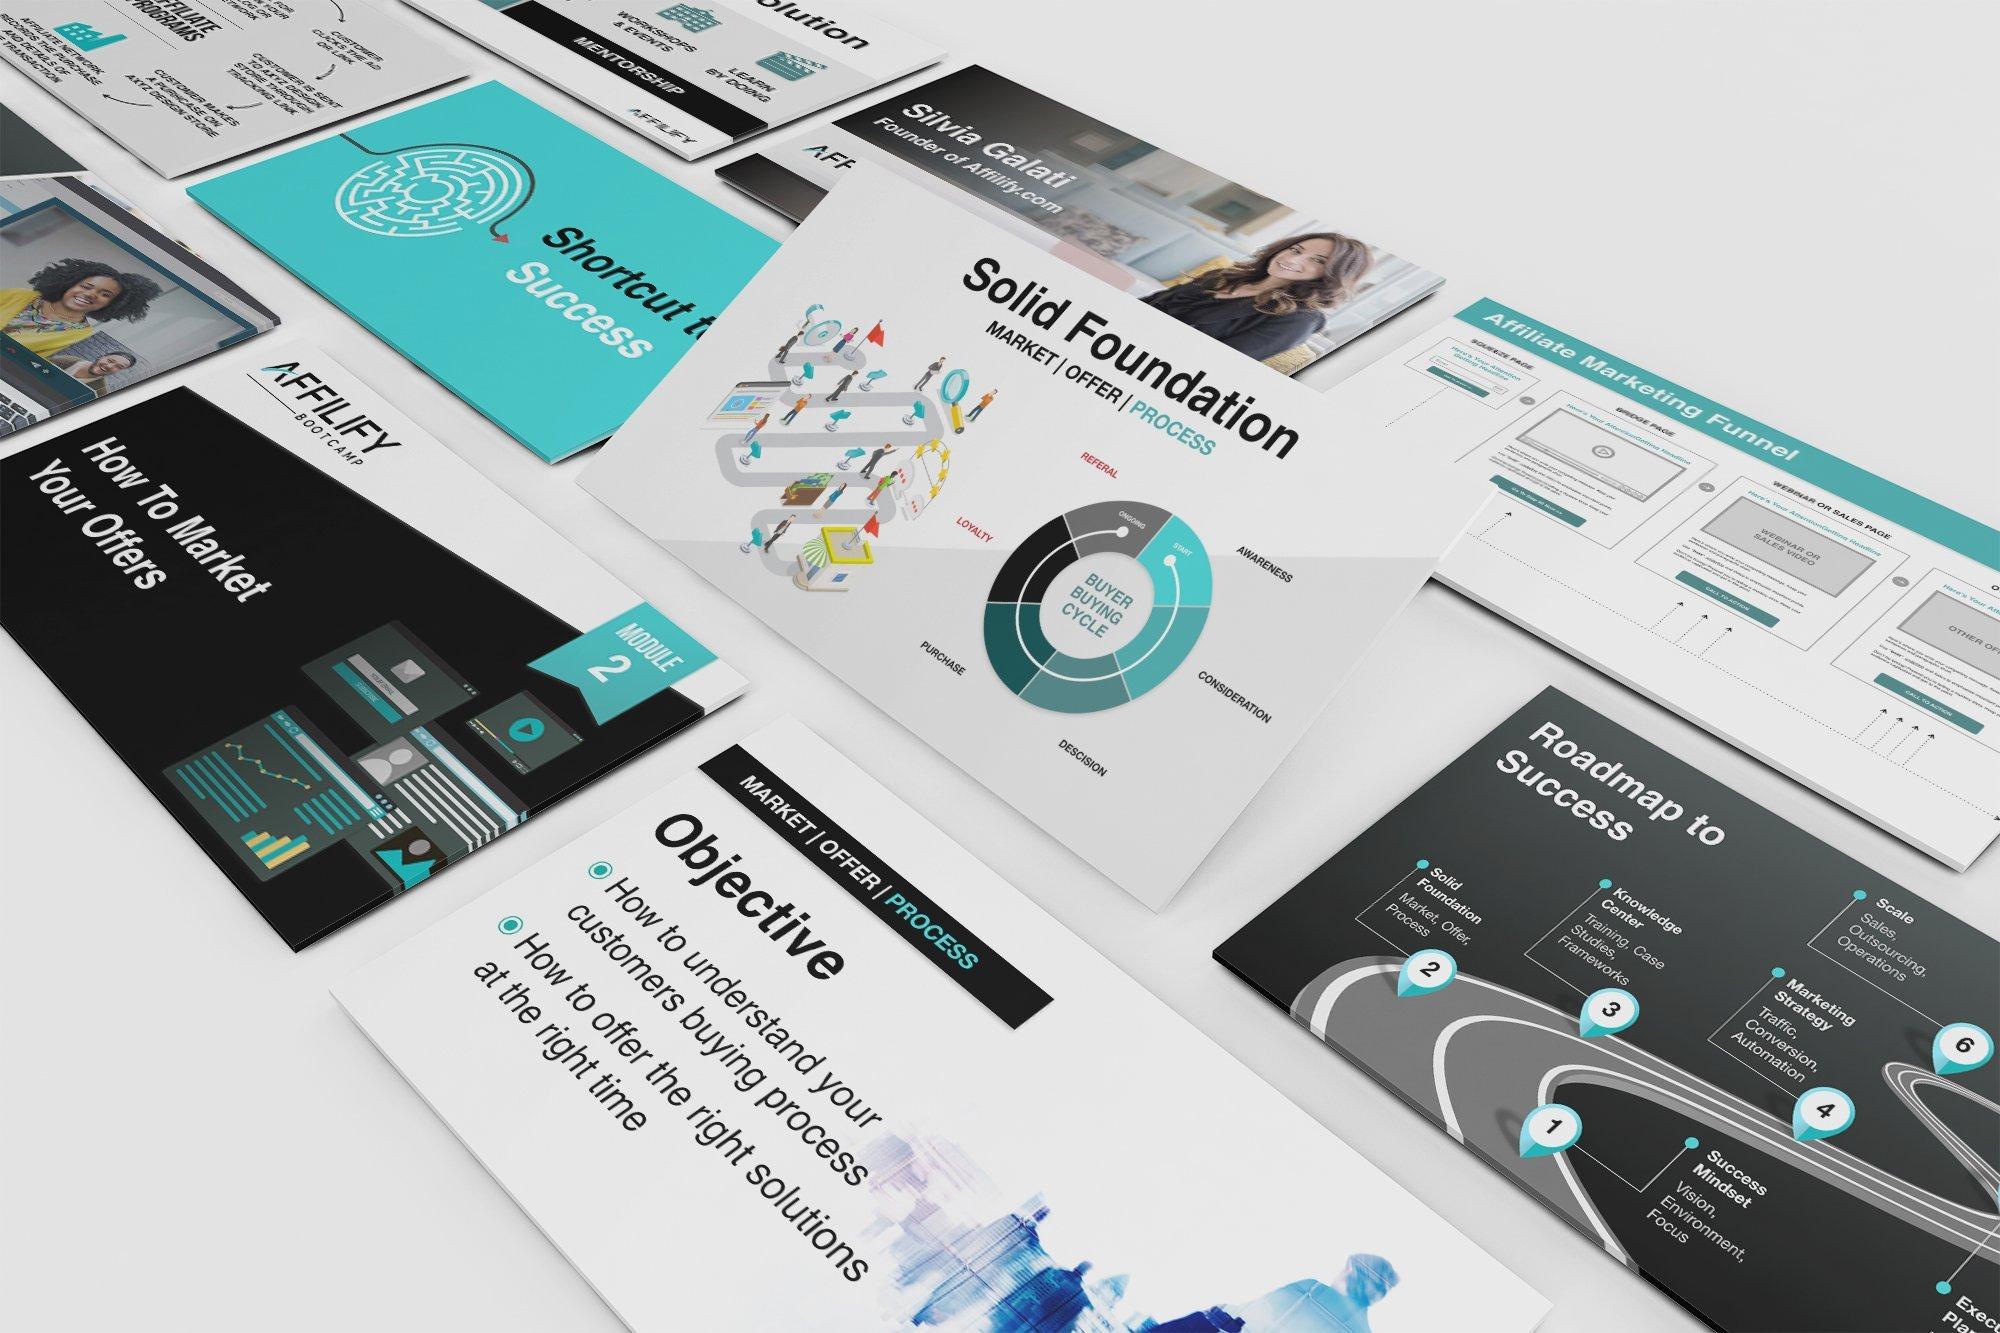 Keynote Online Course Design